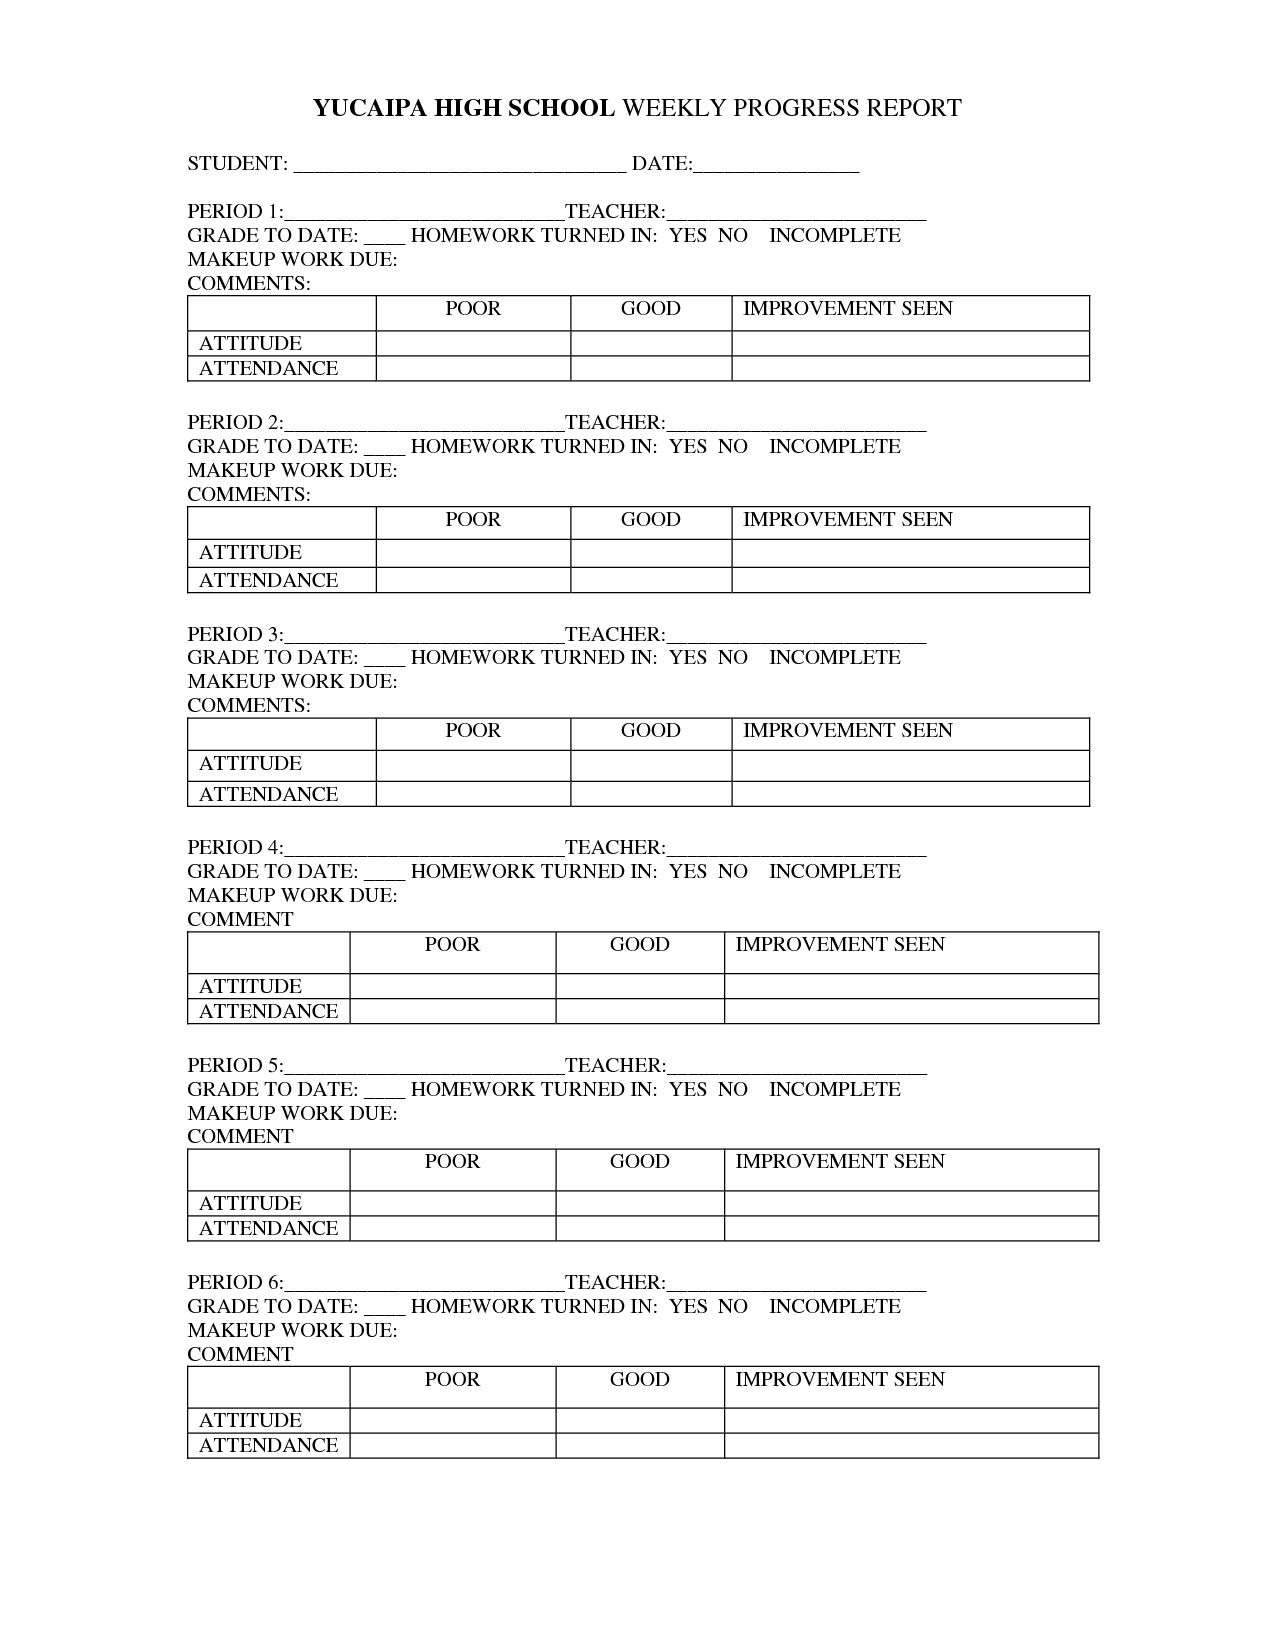 Construction Progress Report Template Excel And Free Construction Estimate Template Excel